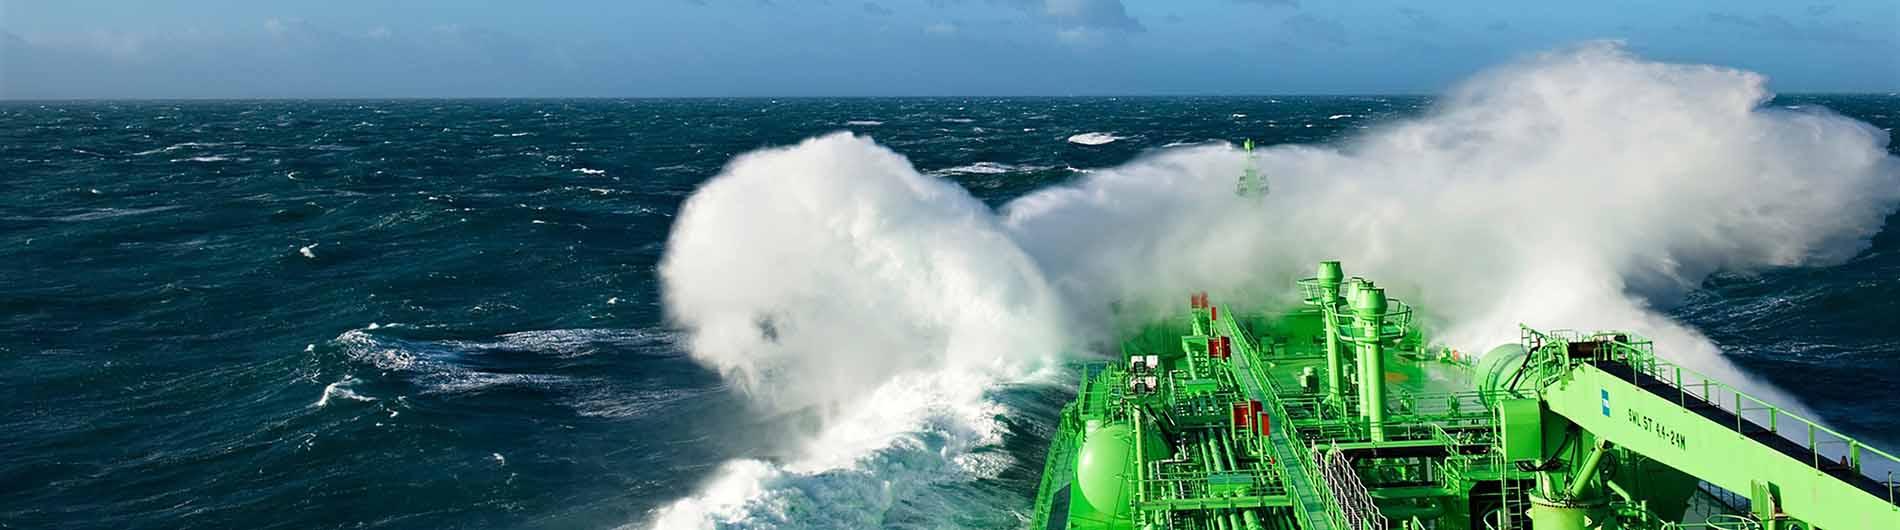 Green Vessel at sea in big waves